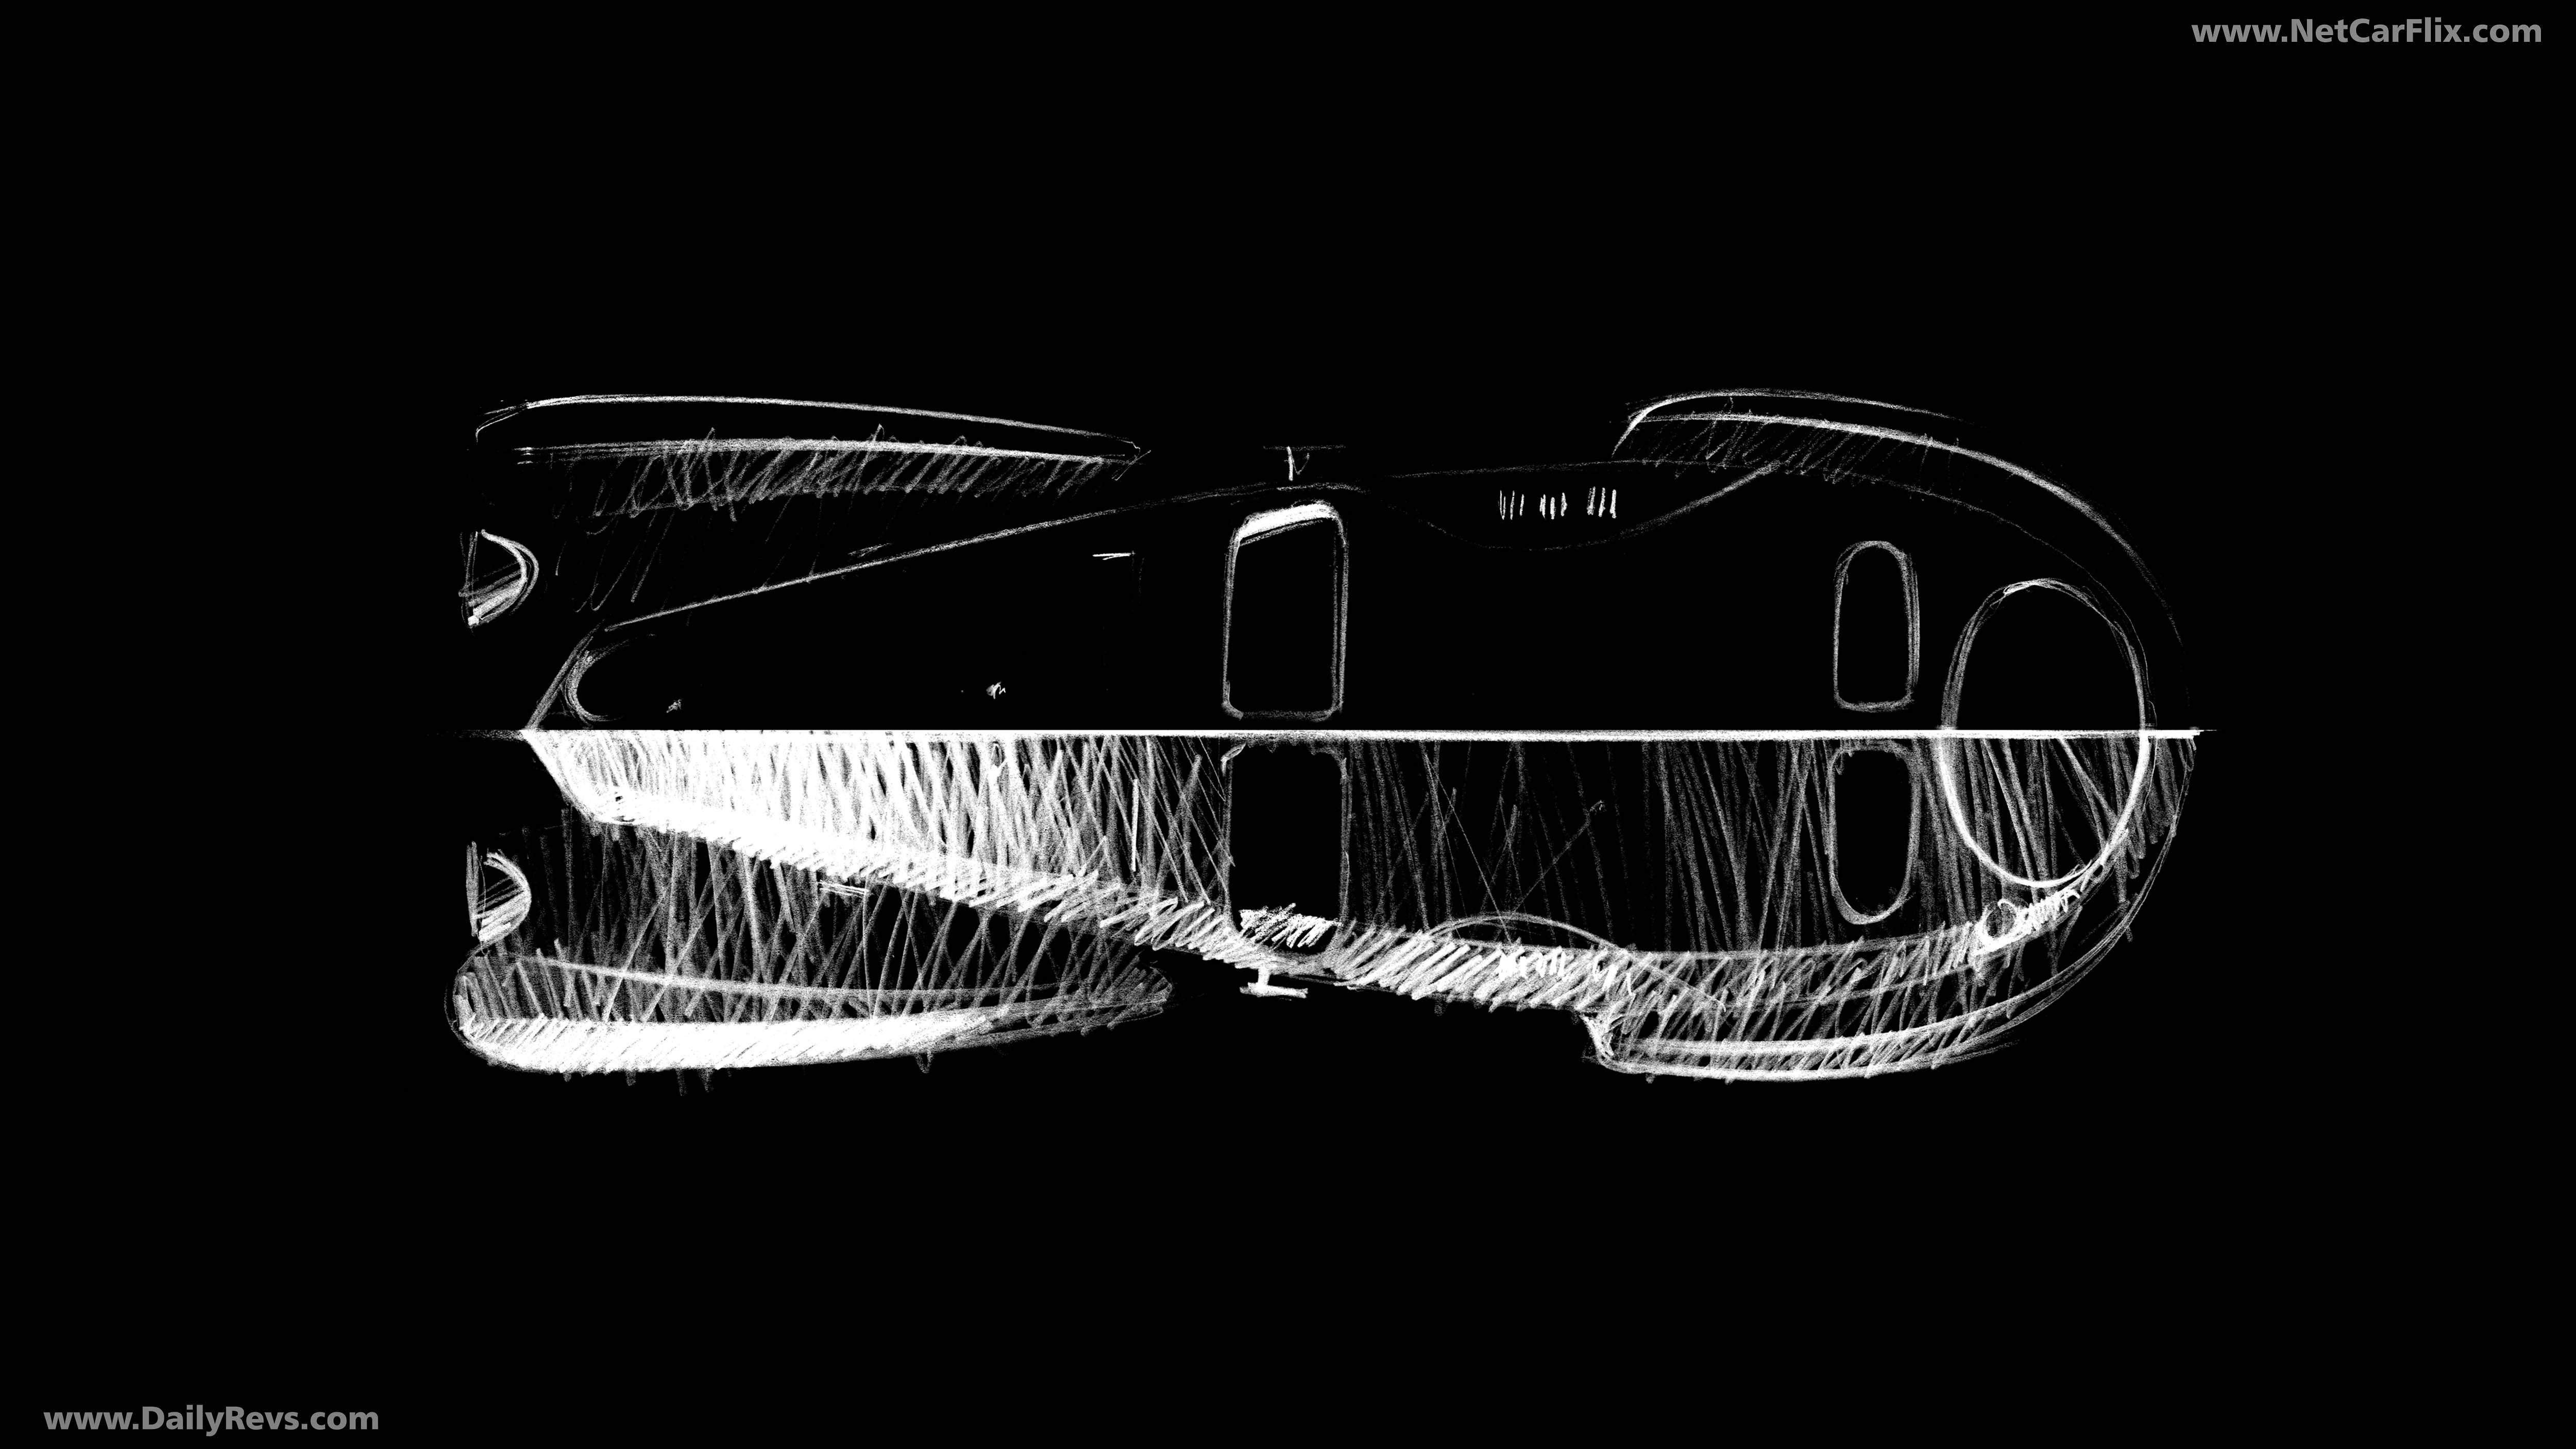 2019 Bugatti La Voiture Noire - HD Pictures, Videos, Specs & Information - Dailyrevs in 2020 ...